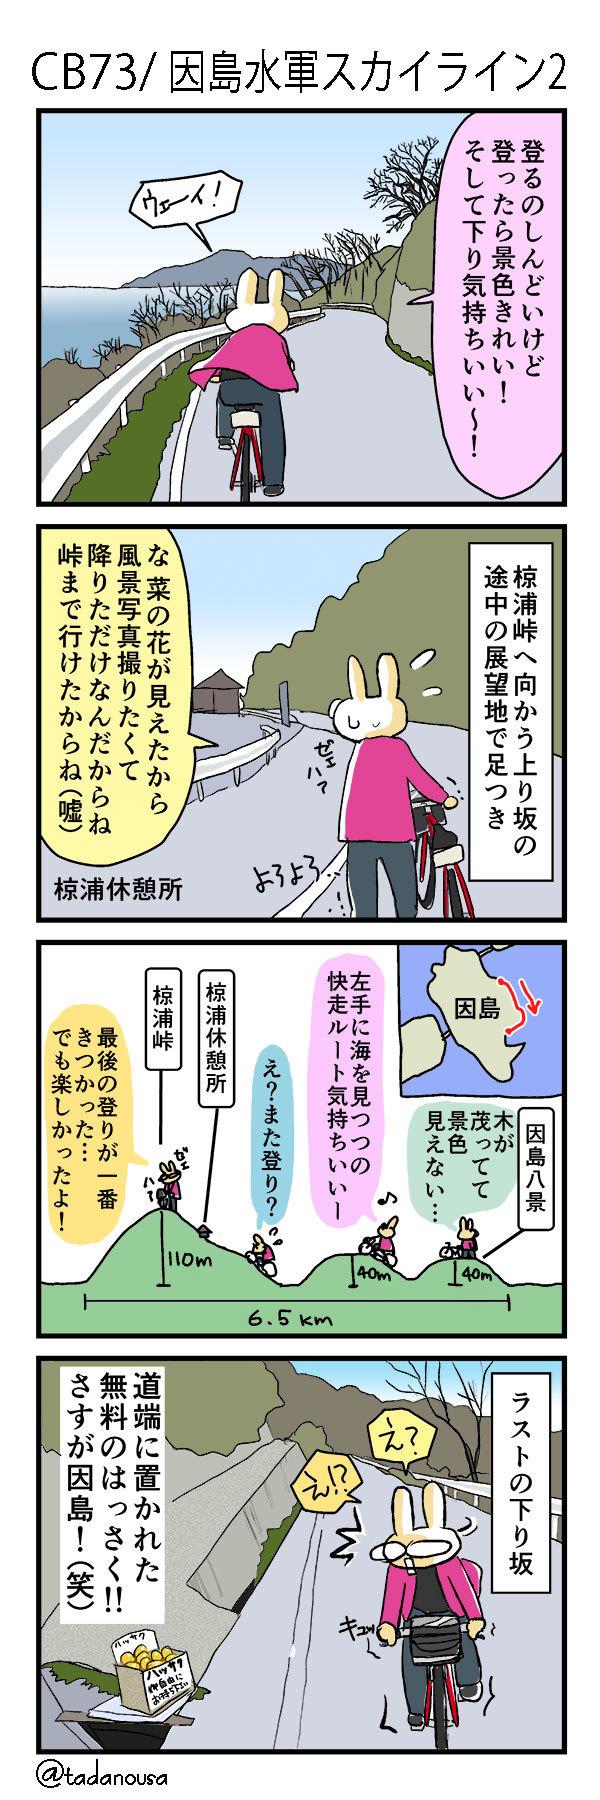 bike_4koma_kako113_s.jpg